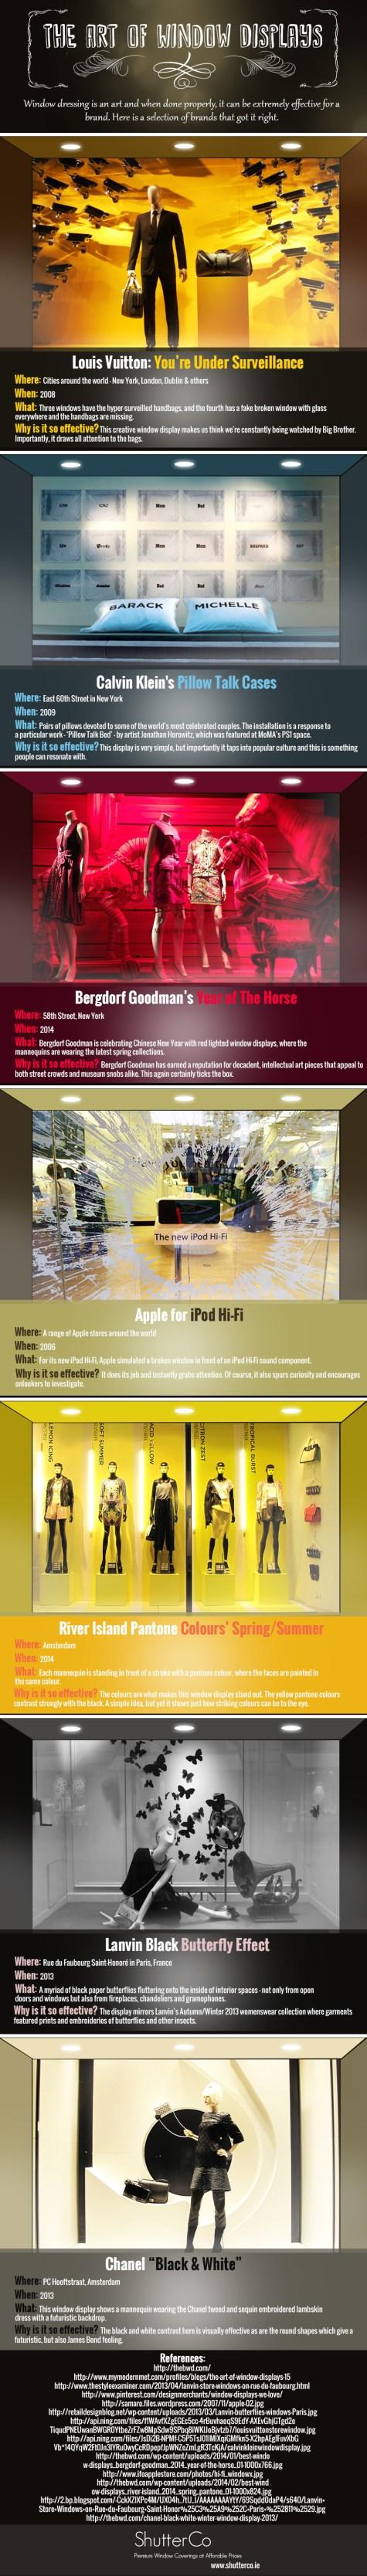 The_Art_of_Window_Displays-Infographic